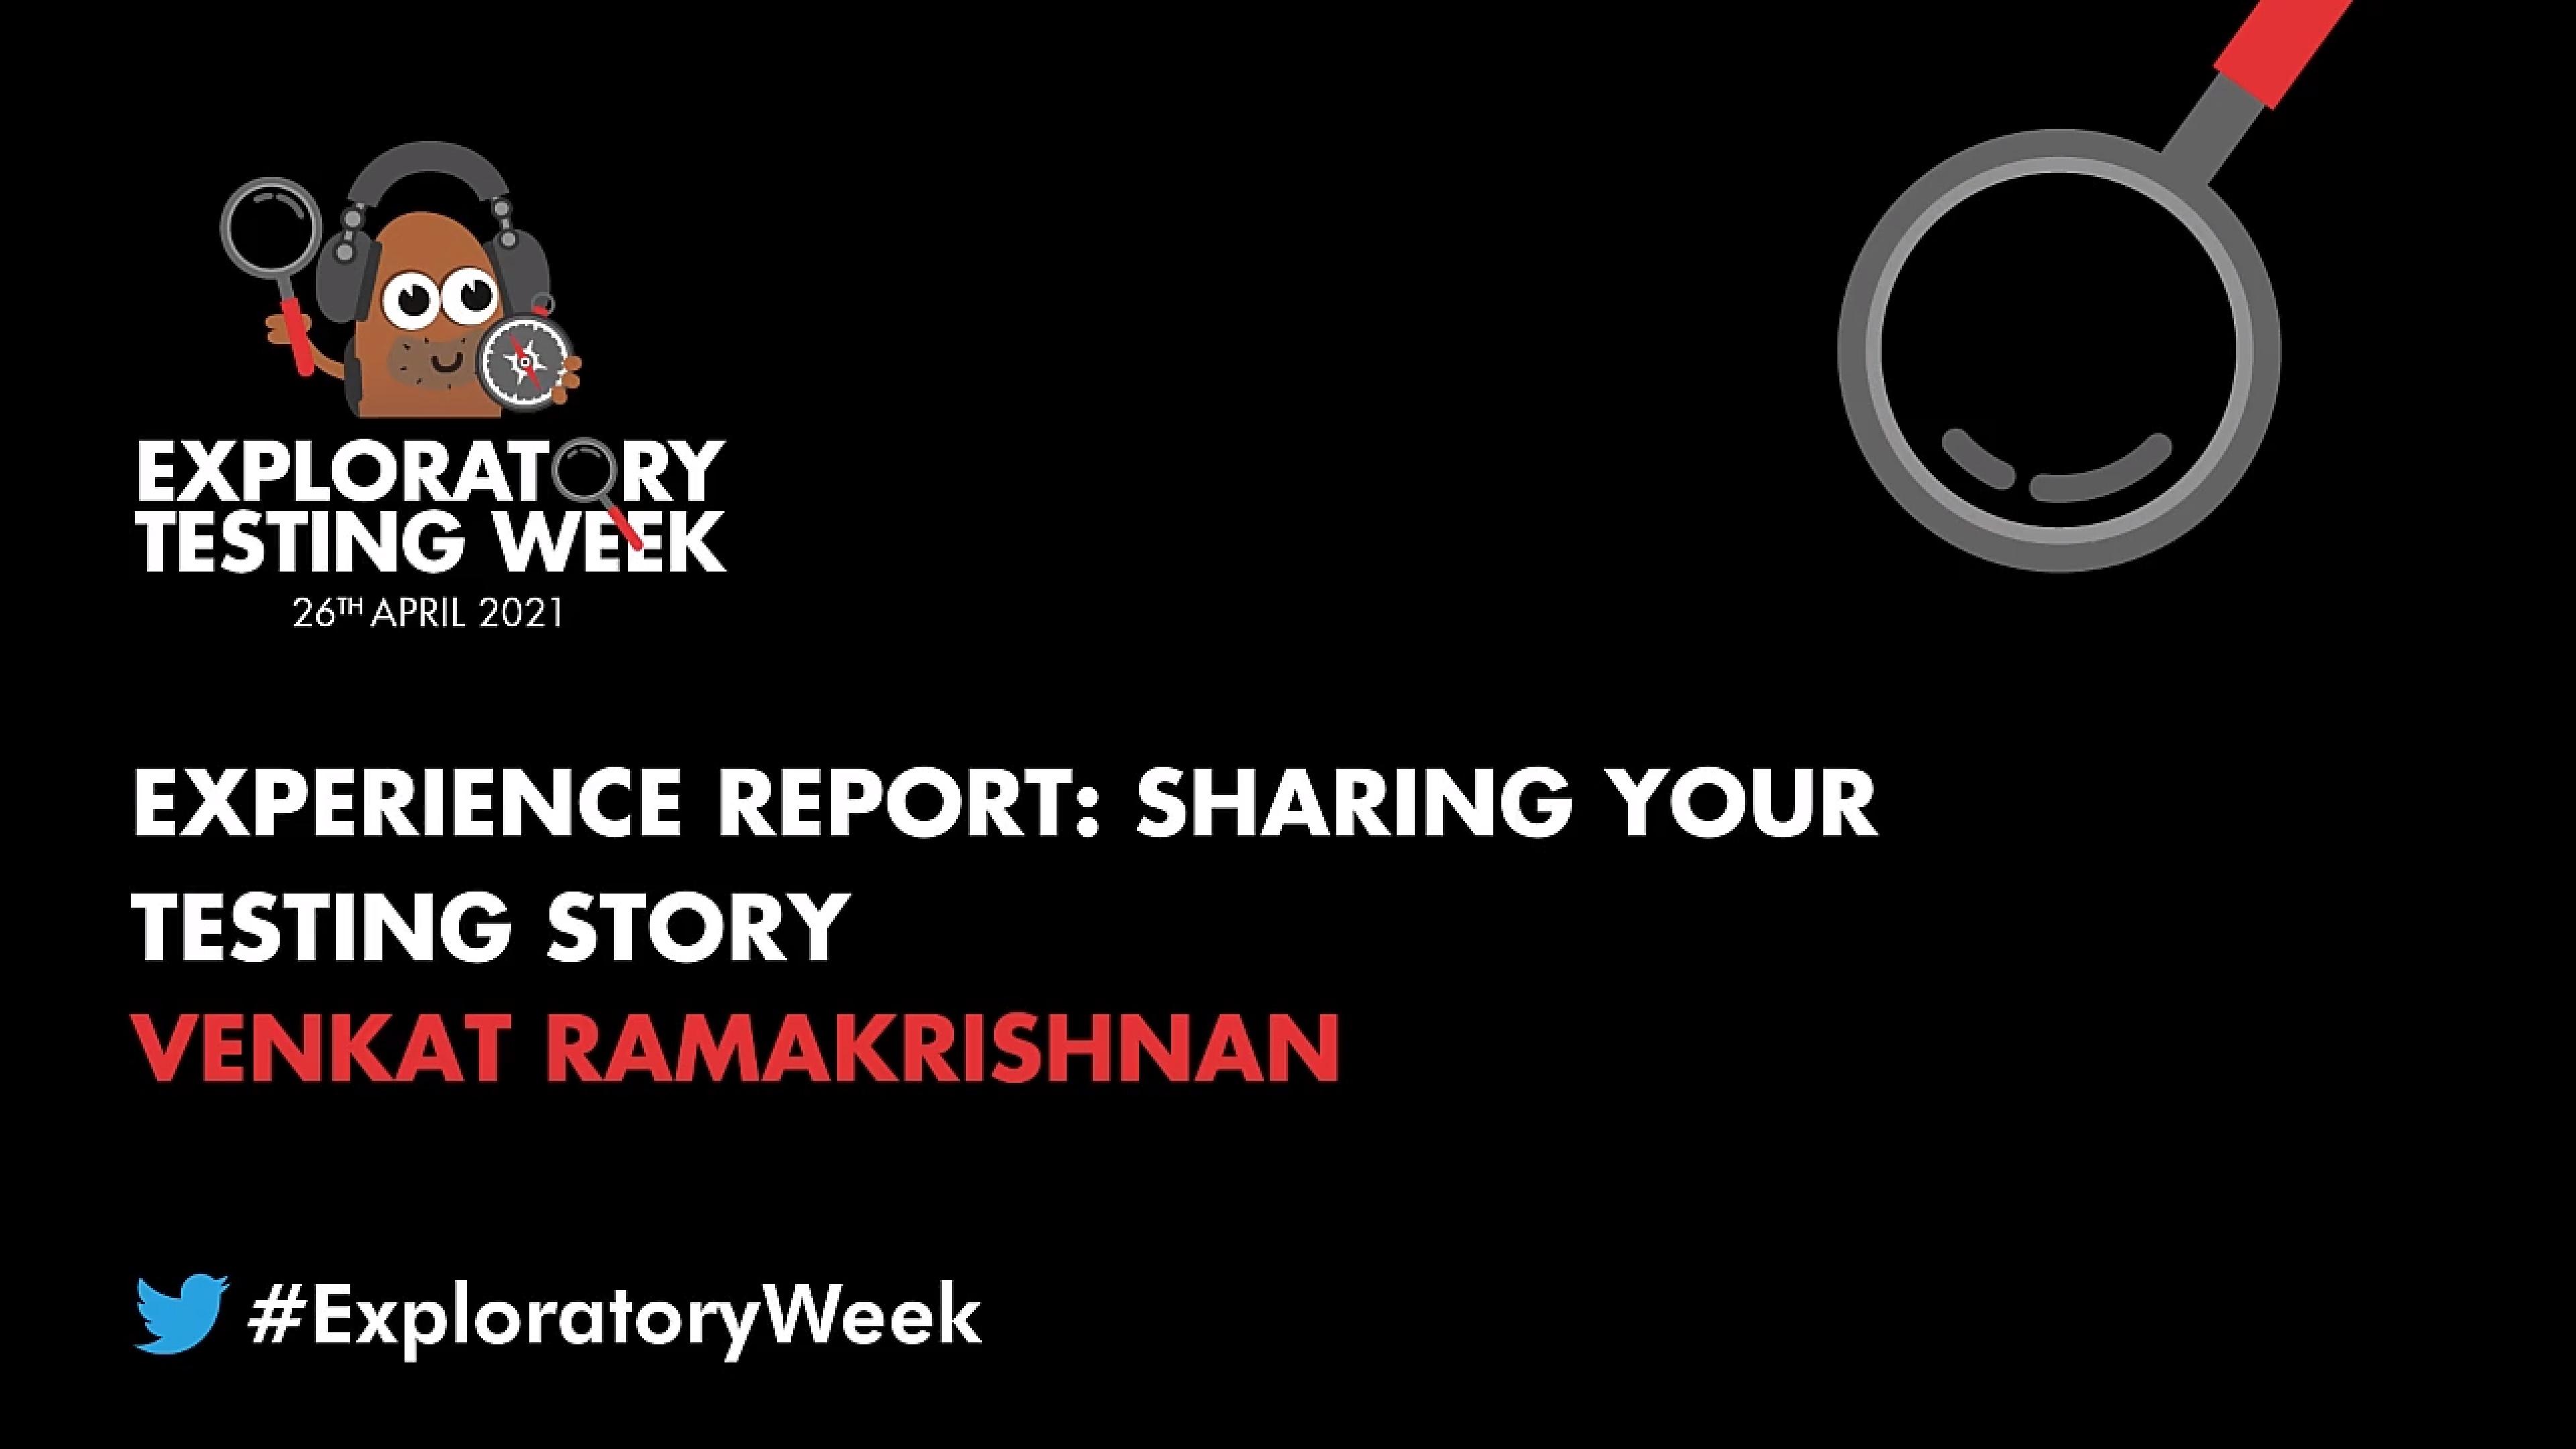 Experience Report: Sharing Your Testing Story with Venkat Ramakrishnan